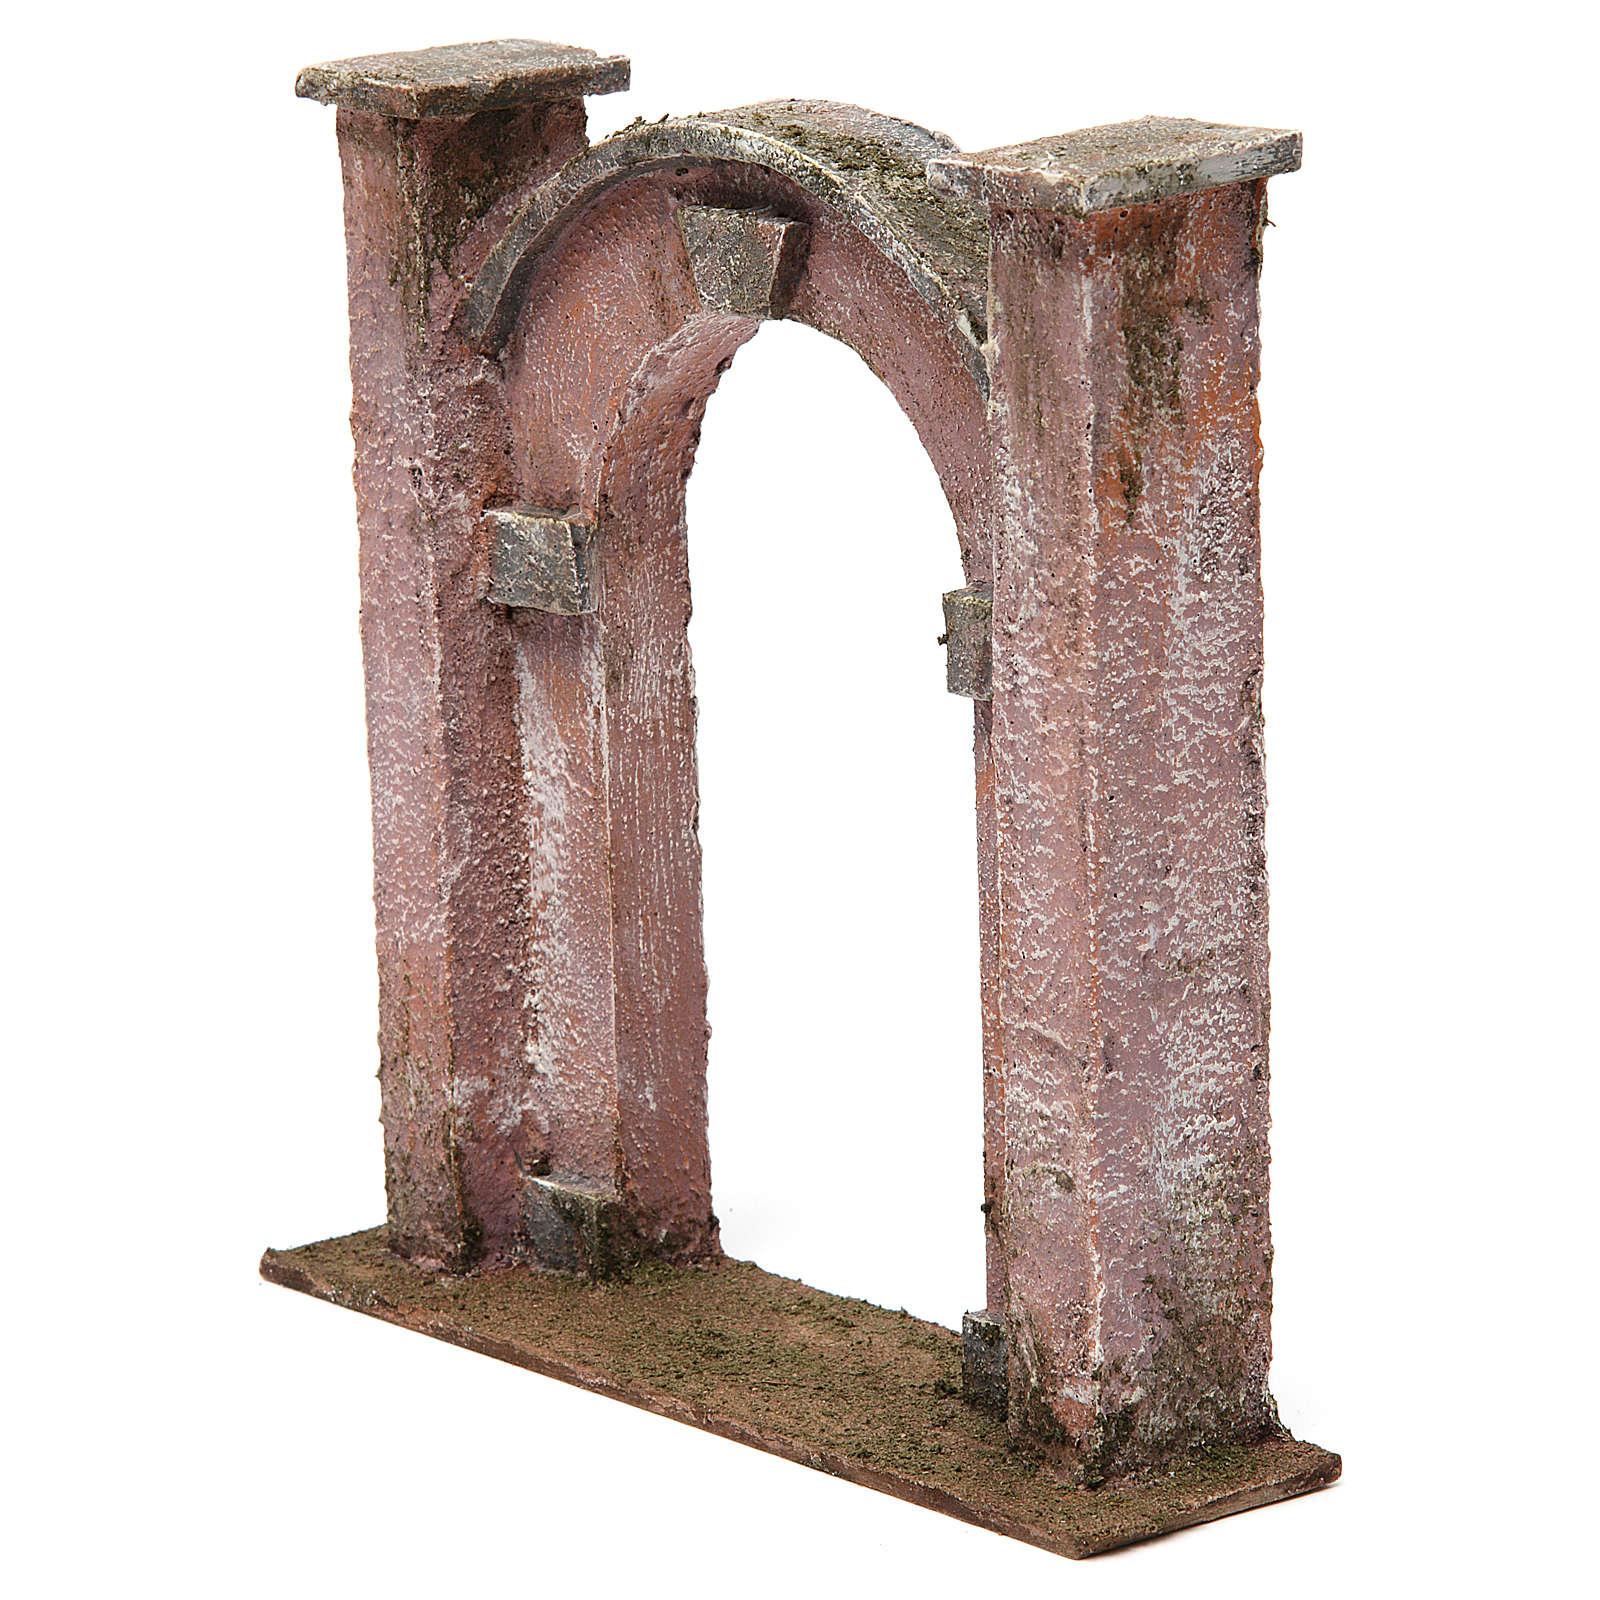 Arco porta per presepe 12 cm 20x5x20 cm 4